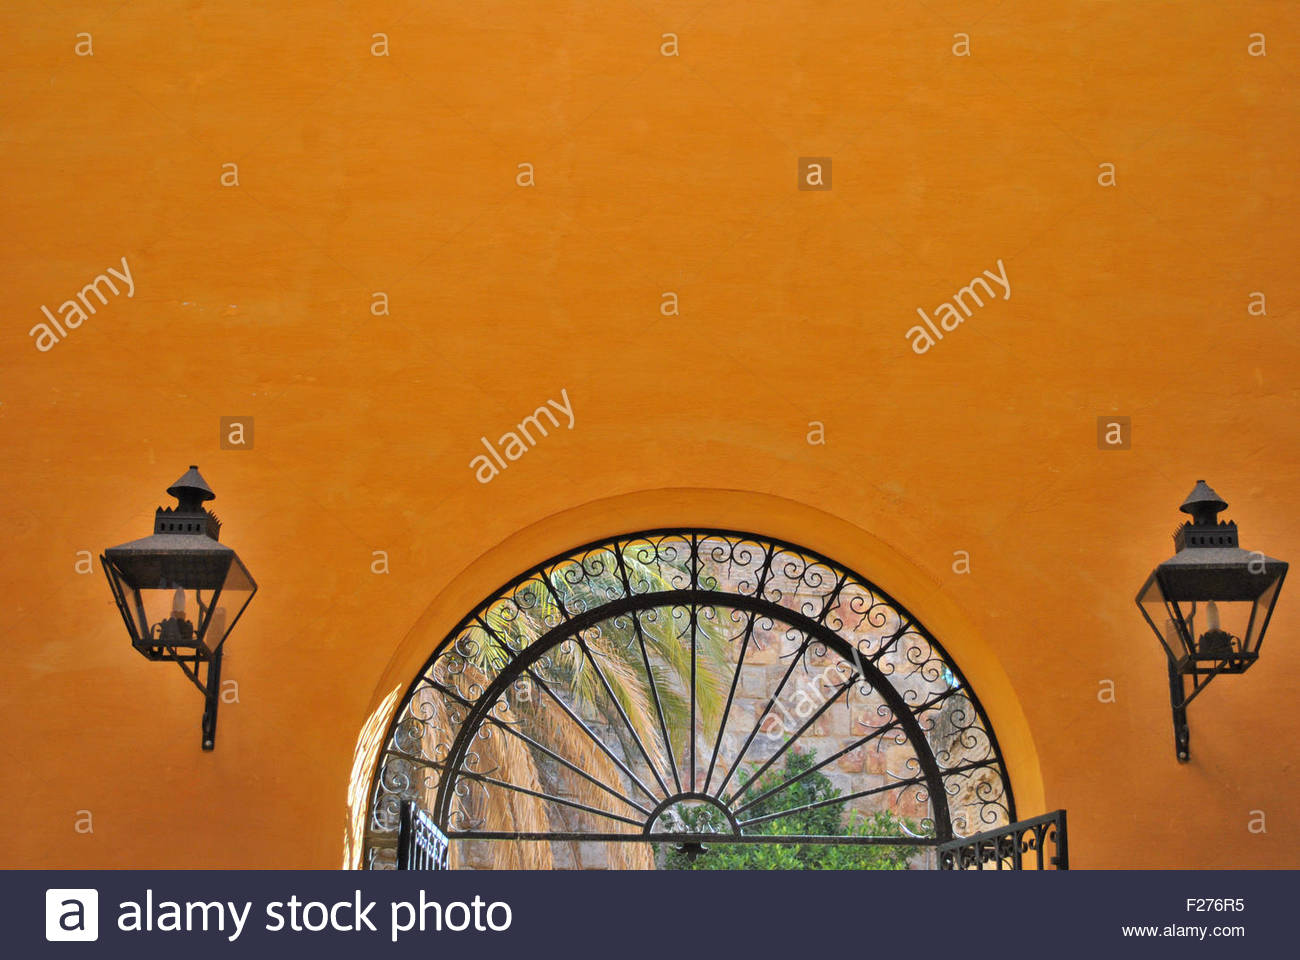 Mediterranean lighters on orange wall - Stock Image